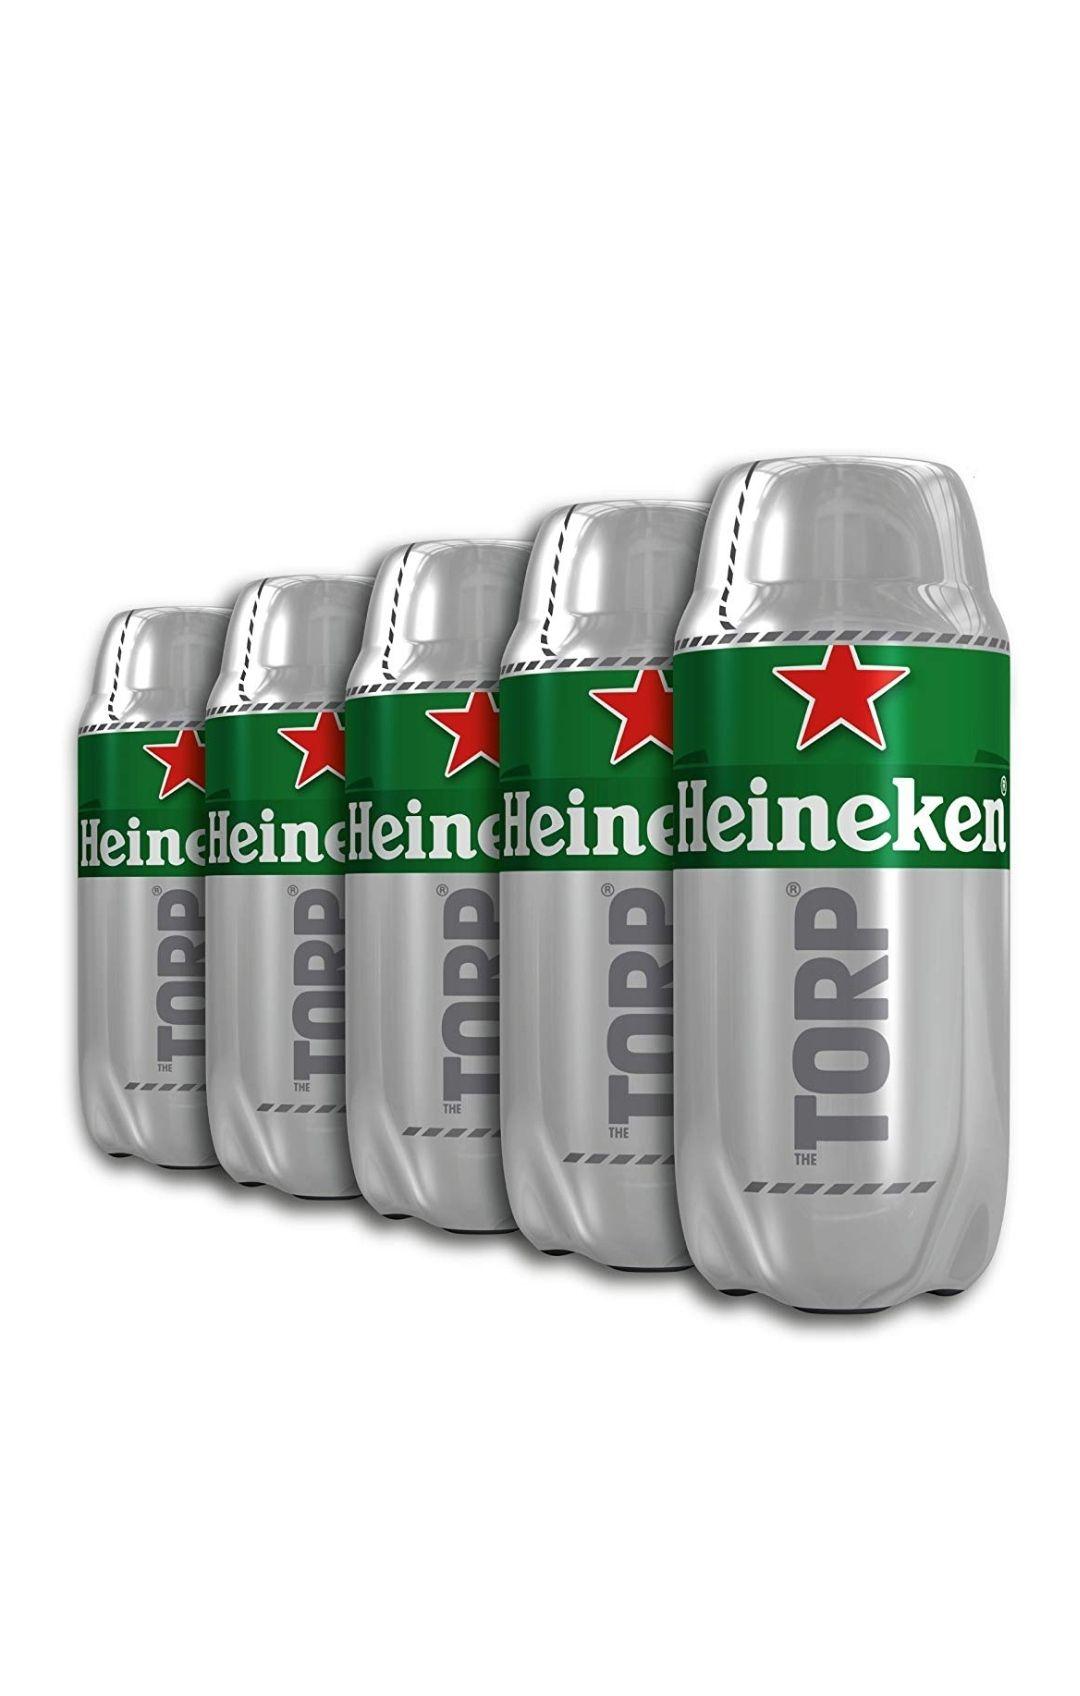 Cerveza Heineken - 5 barriles de 2l. Total 10L